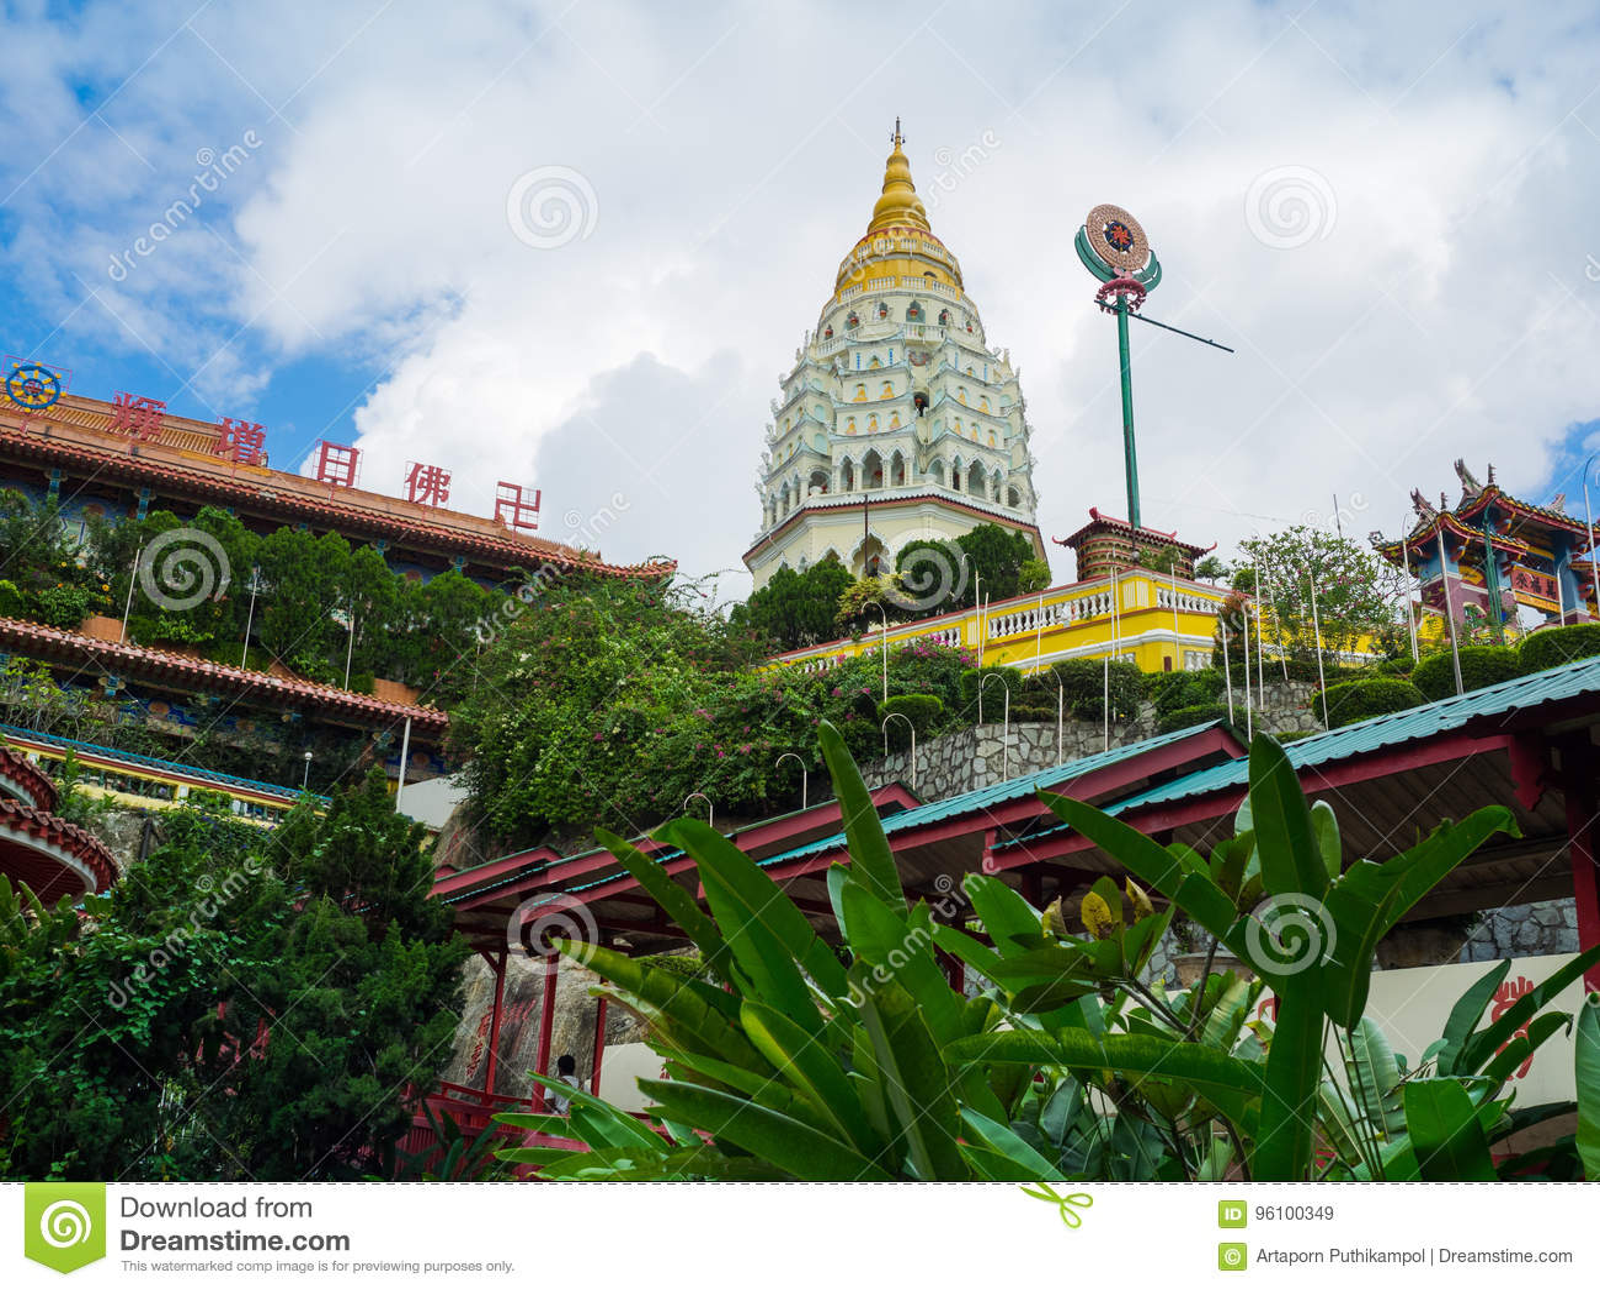 Kek Lok Si Temple in Georgetown, Penang, Malaysia